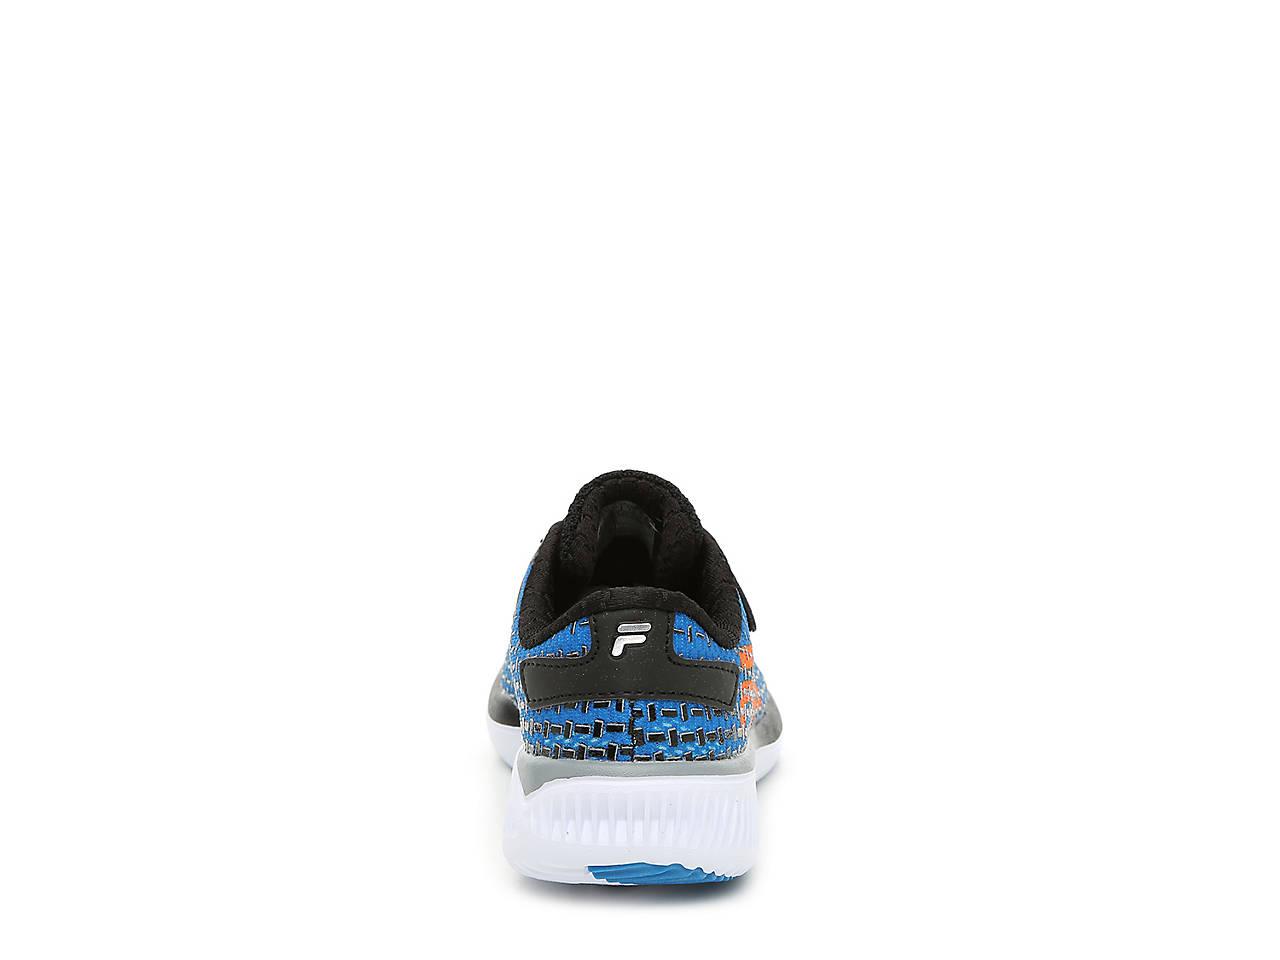 9f1ddff5265f Fila Valant 3 Toddler   Youth Sneaker Kids Shoes